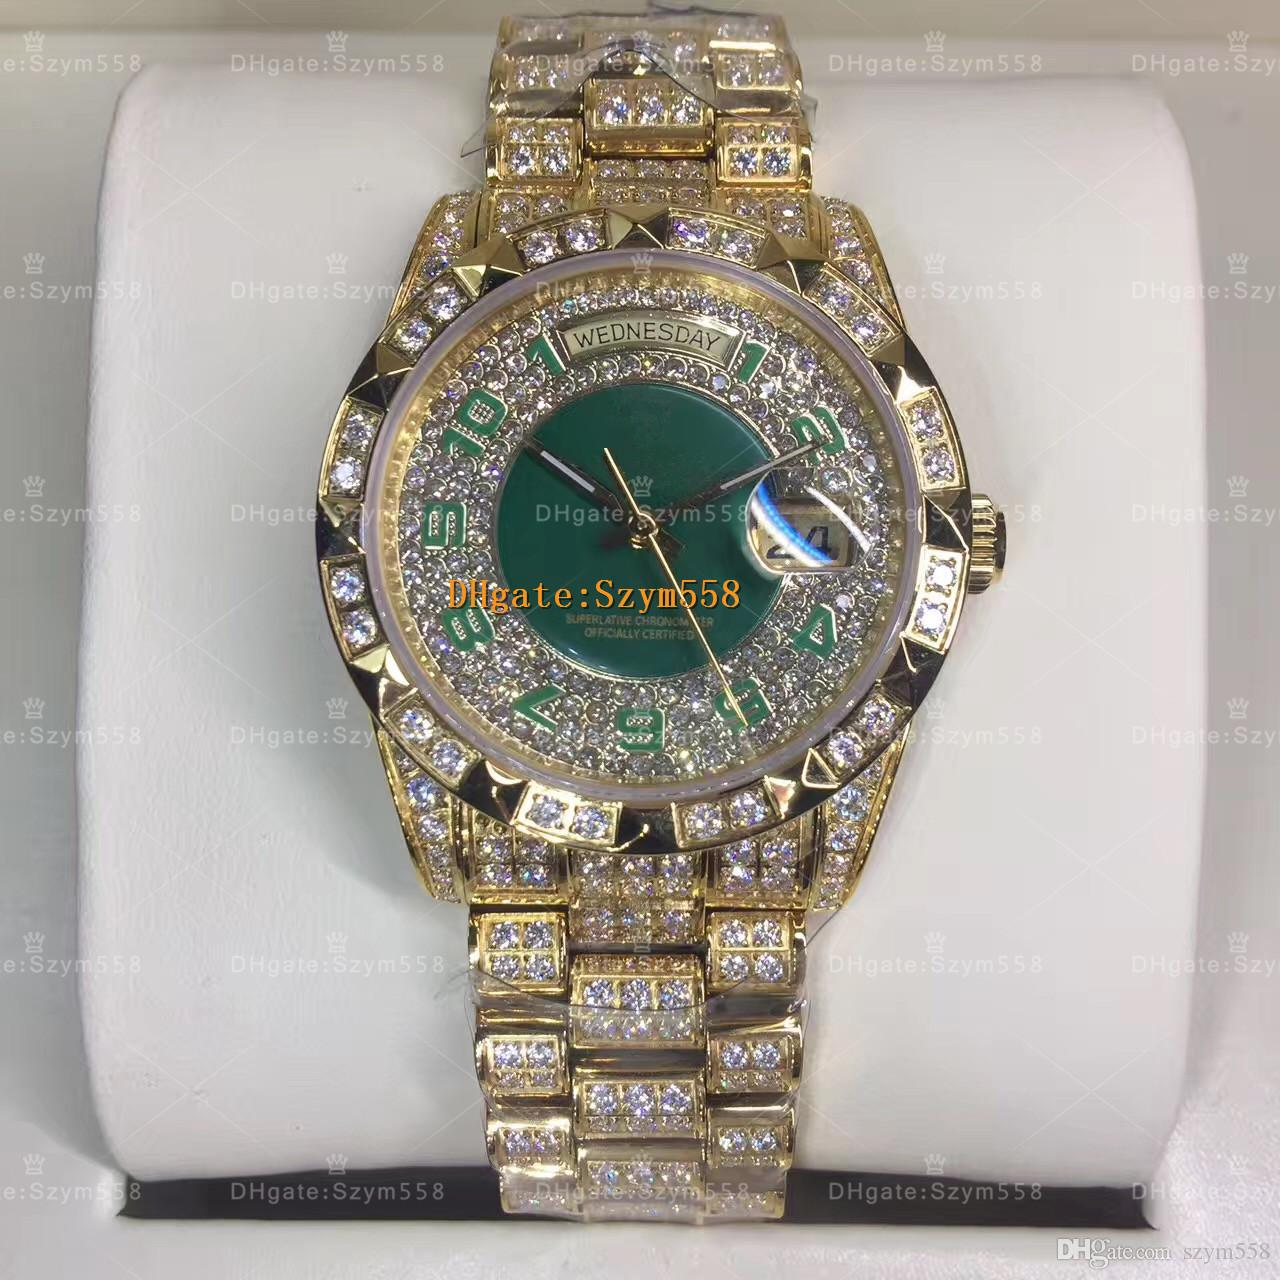 Luxury Watch Diamond Watch High Quality ETA 2836 Automatic Movement Men's Waterproof 36MM Iced Out Watch 316 Stainless Steel CZ Diamond